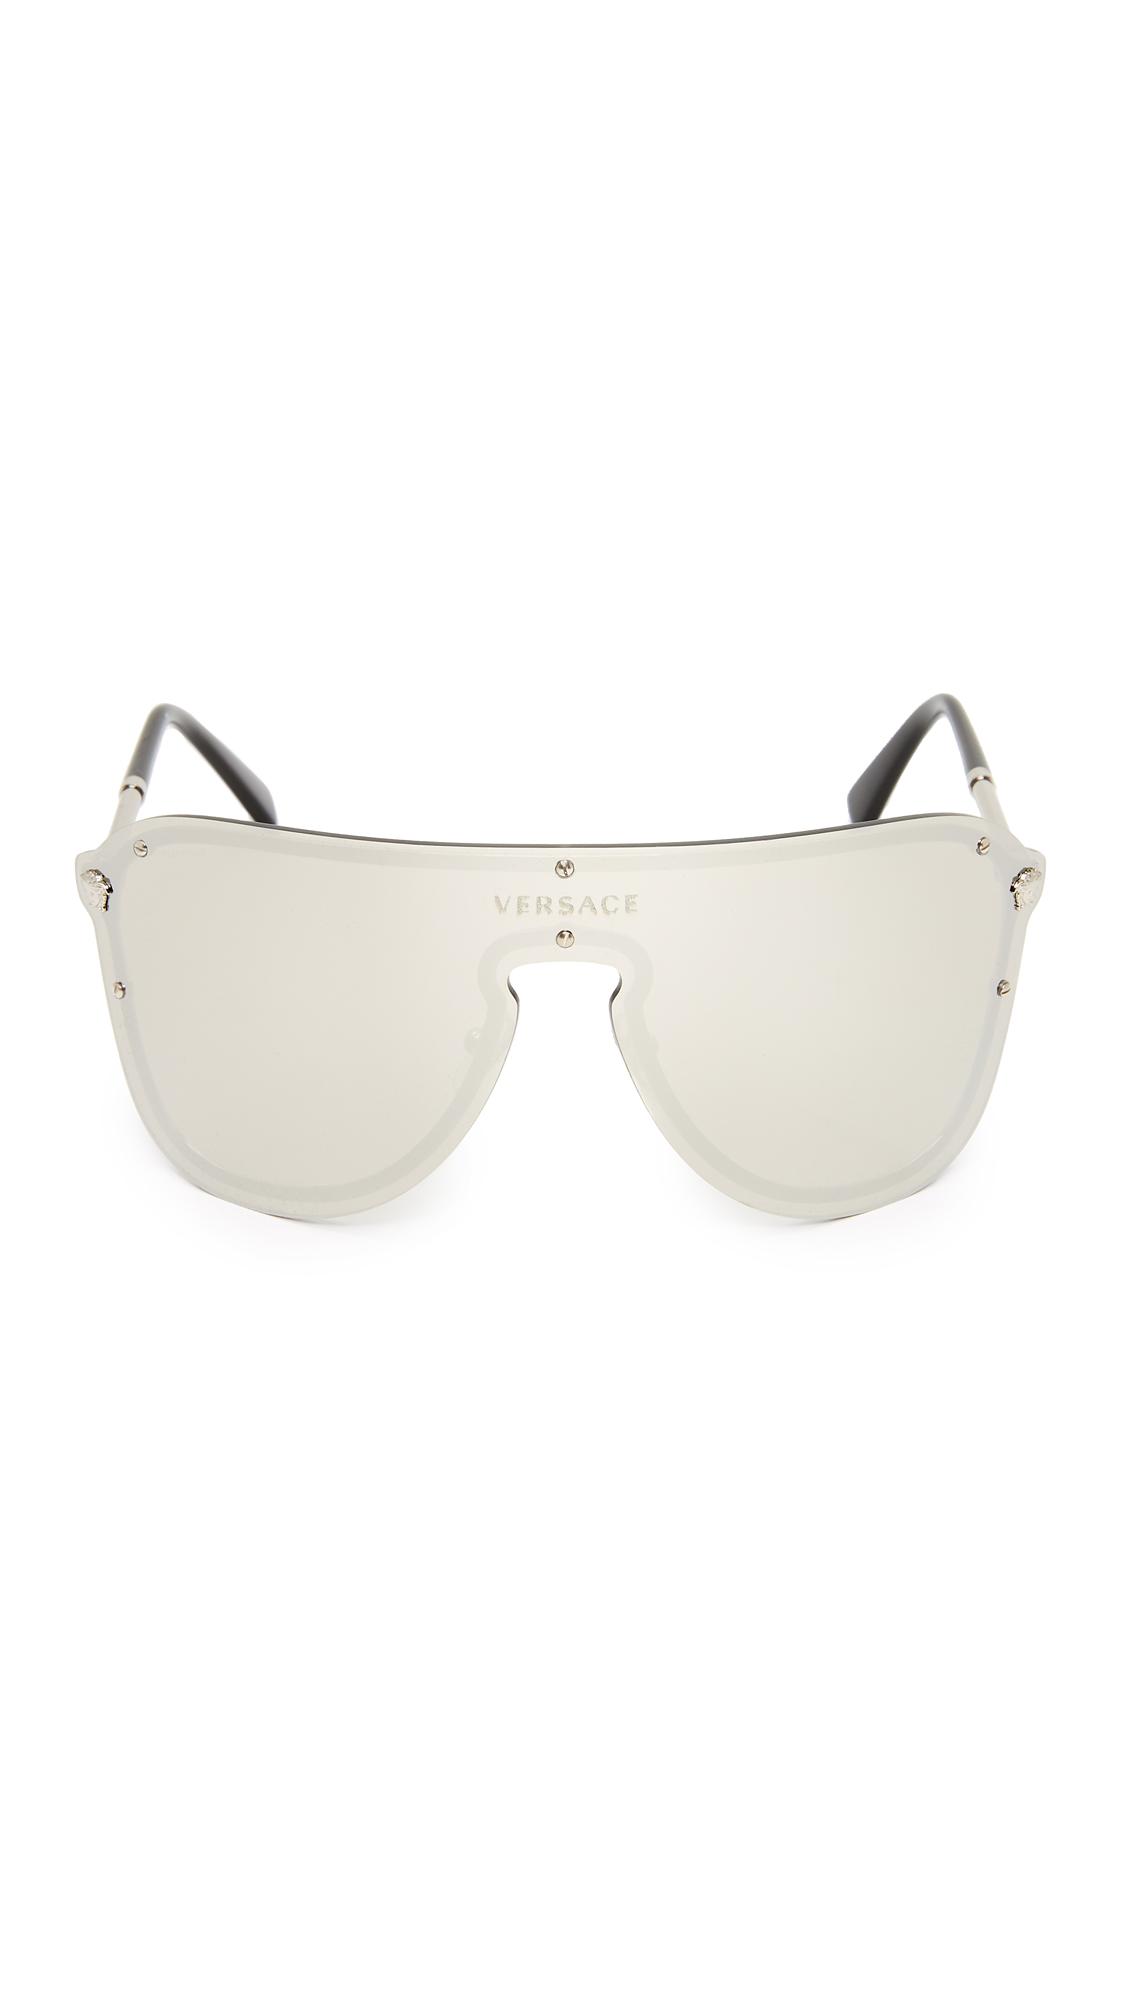 fe387080588 Versace Mirrored Shield Sunglasses